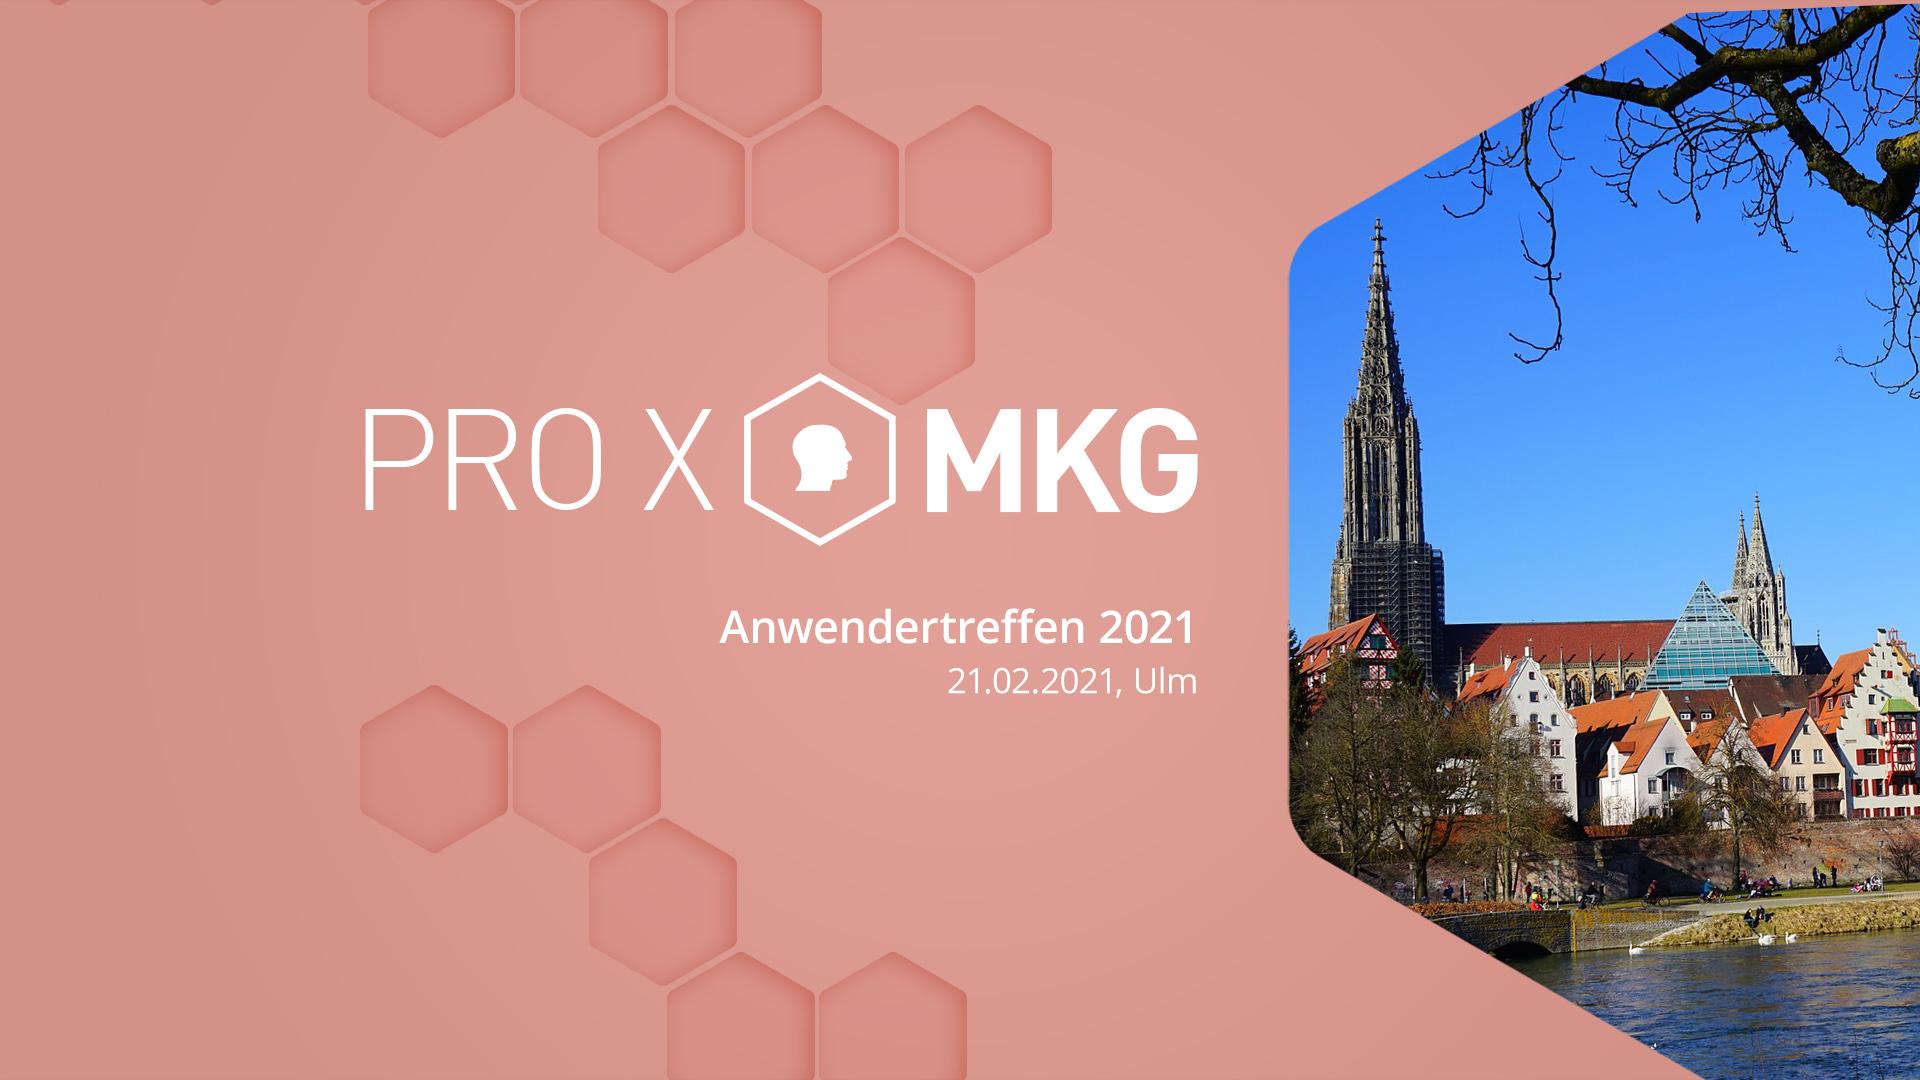 Februar21 - PRO X MKG Anwendertreffen 2021